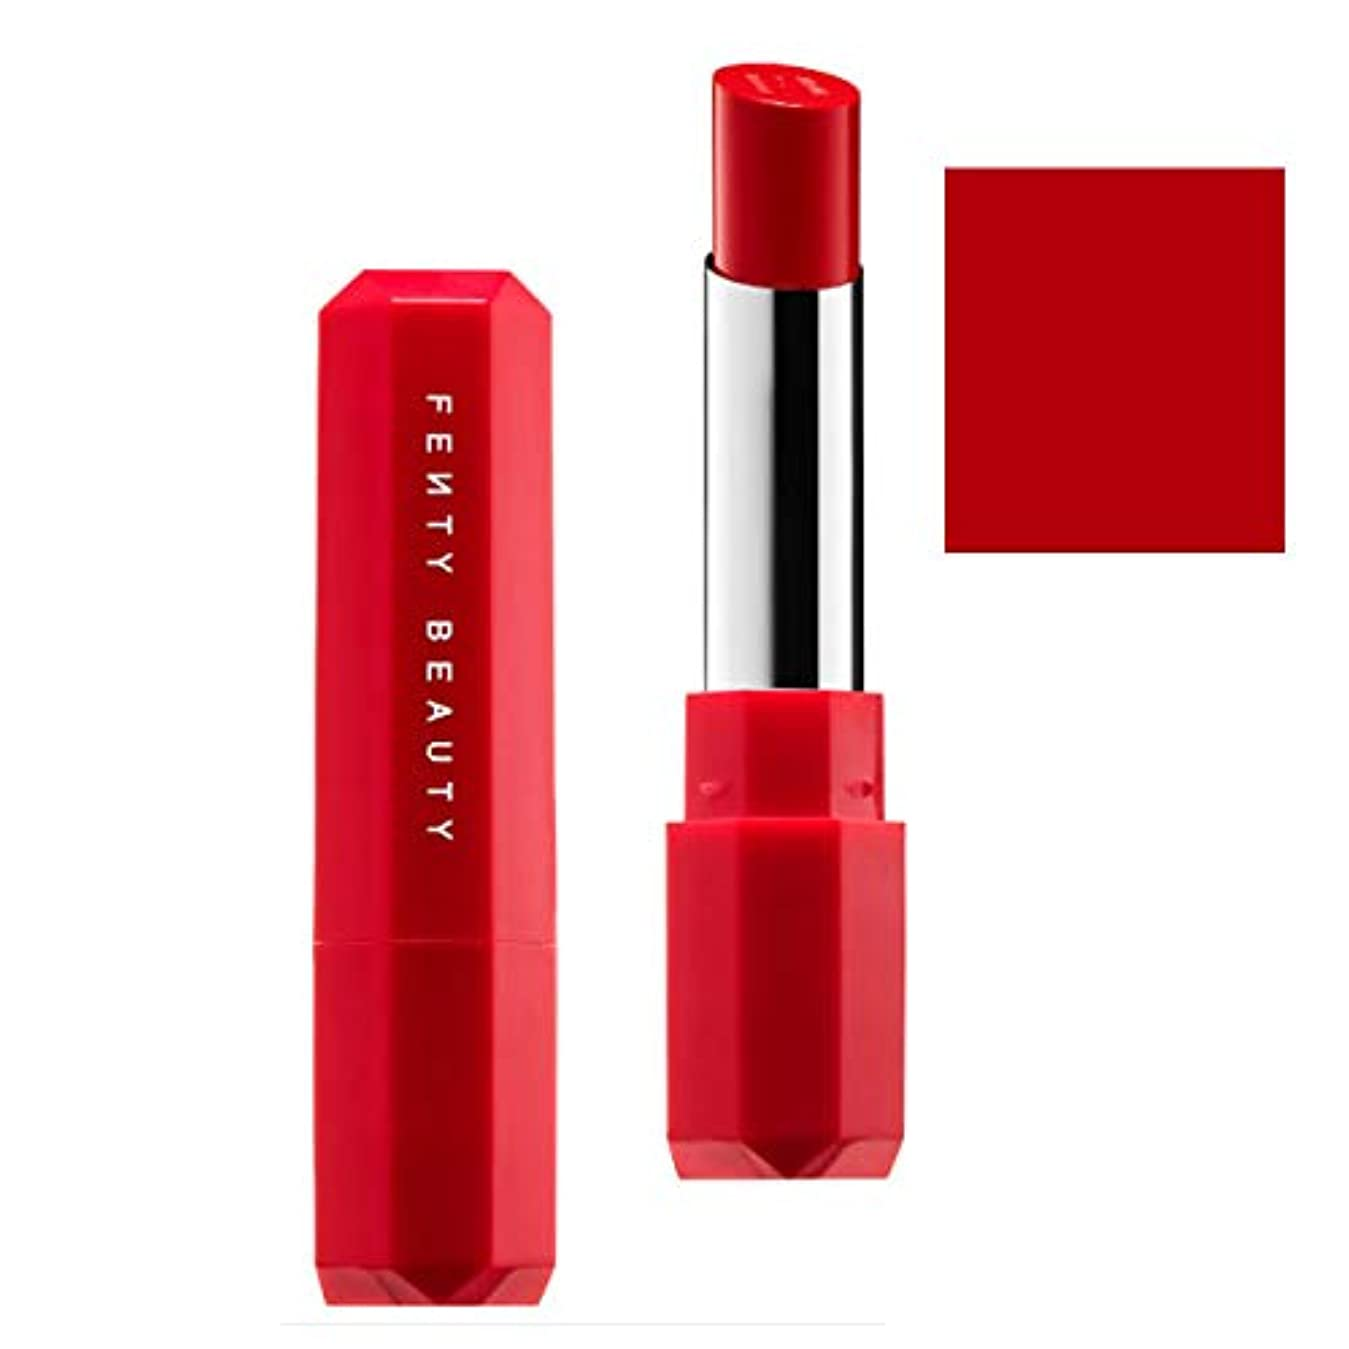 多年生ドット有名人FENTY BEAUTY BY RIHANNA,New!!, 限定版 limited-edition, Poutsicle Juicy Satin Lipstick - Hot Blooded [海外直送品] [並行輸入品]